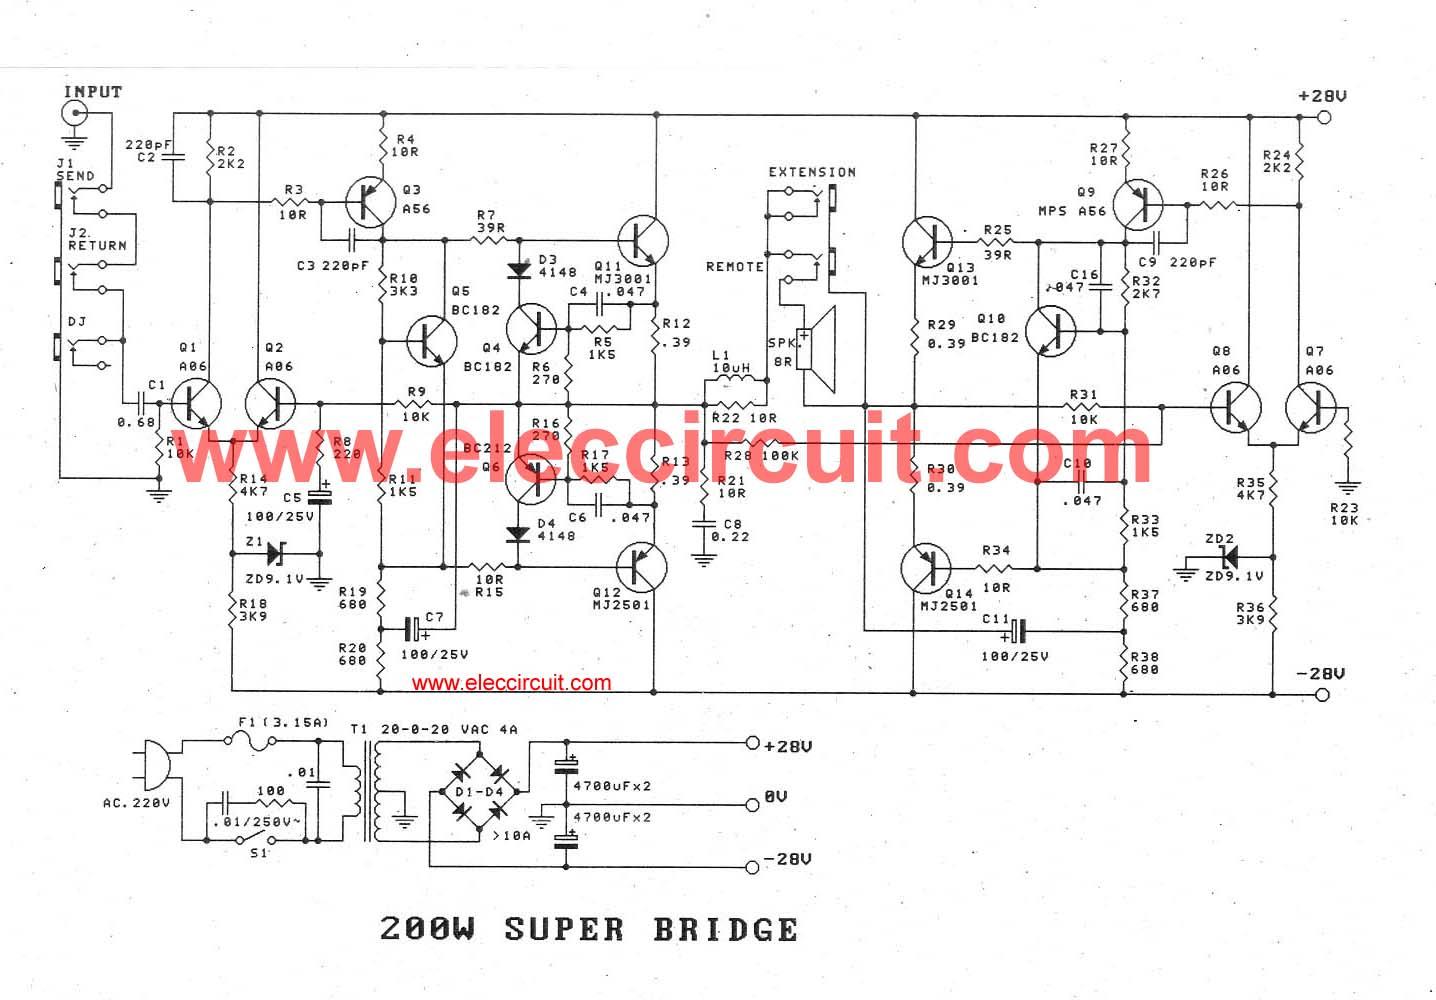 2000 watts power amplifier schematic diagram free vehicle wiring diagrams pdf spl 600 watt amp get image about